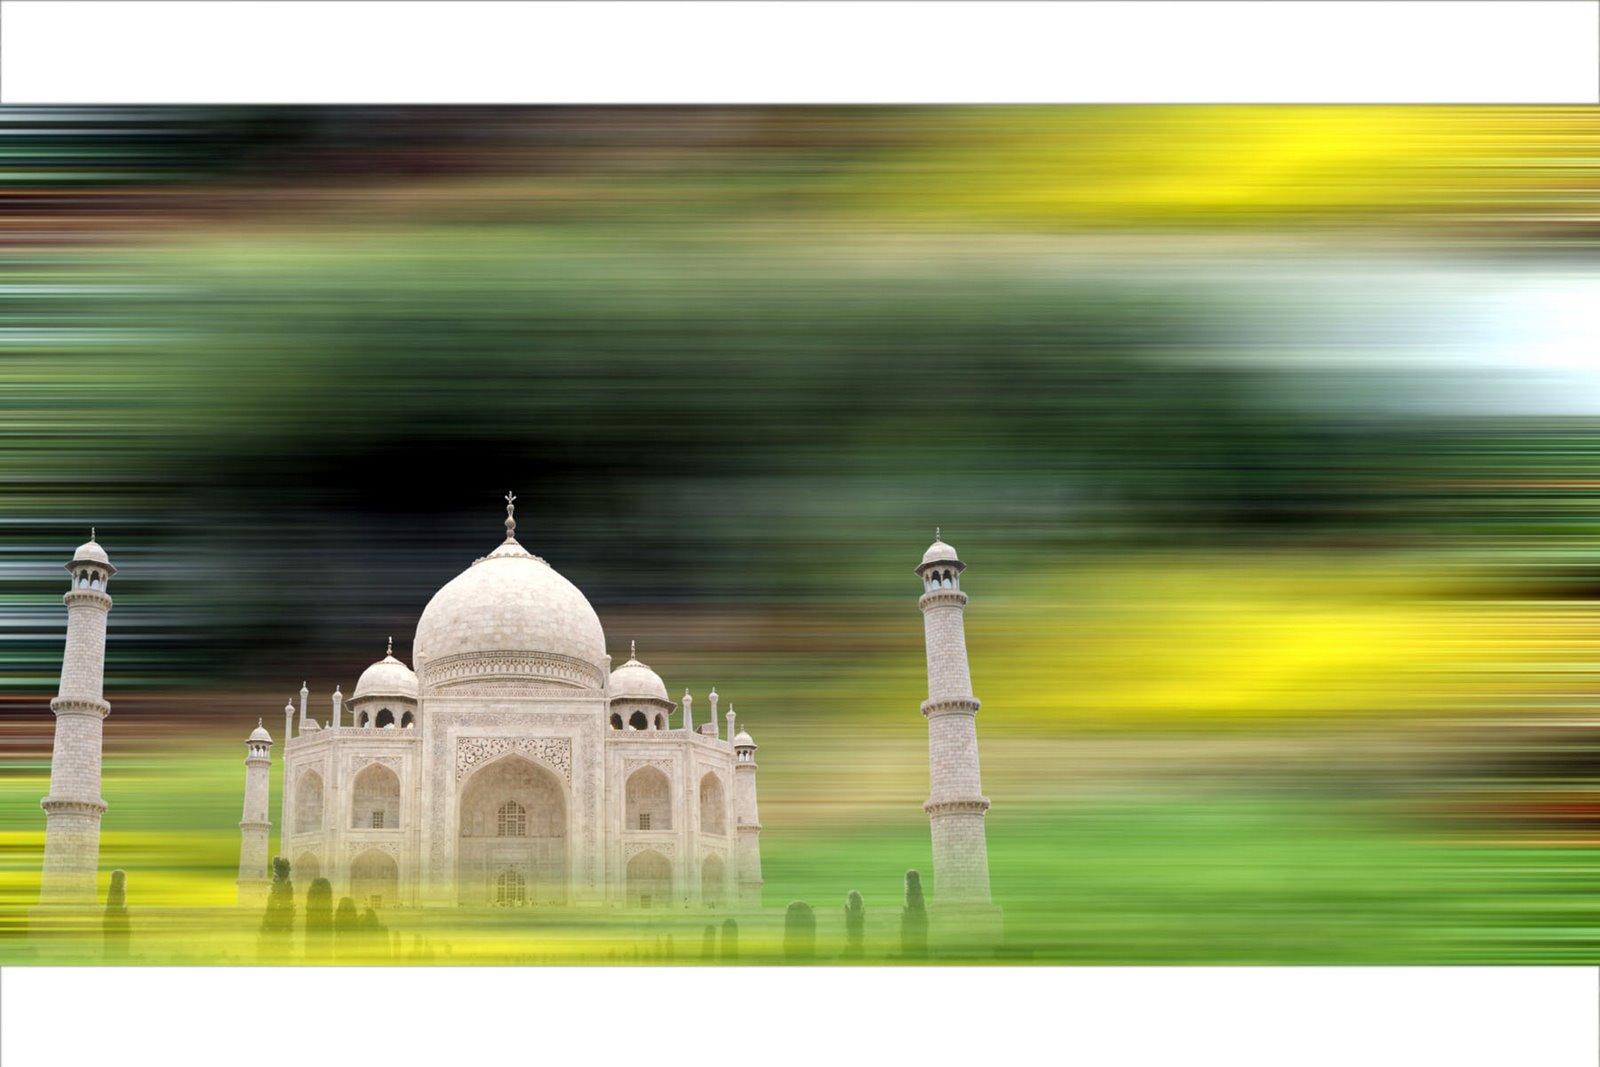 how to change background using adobe photoshop